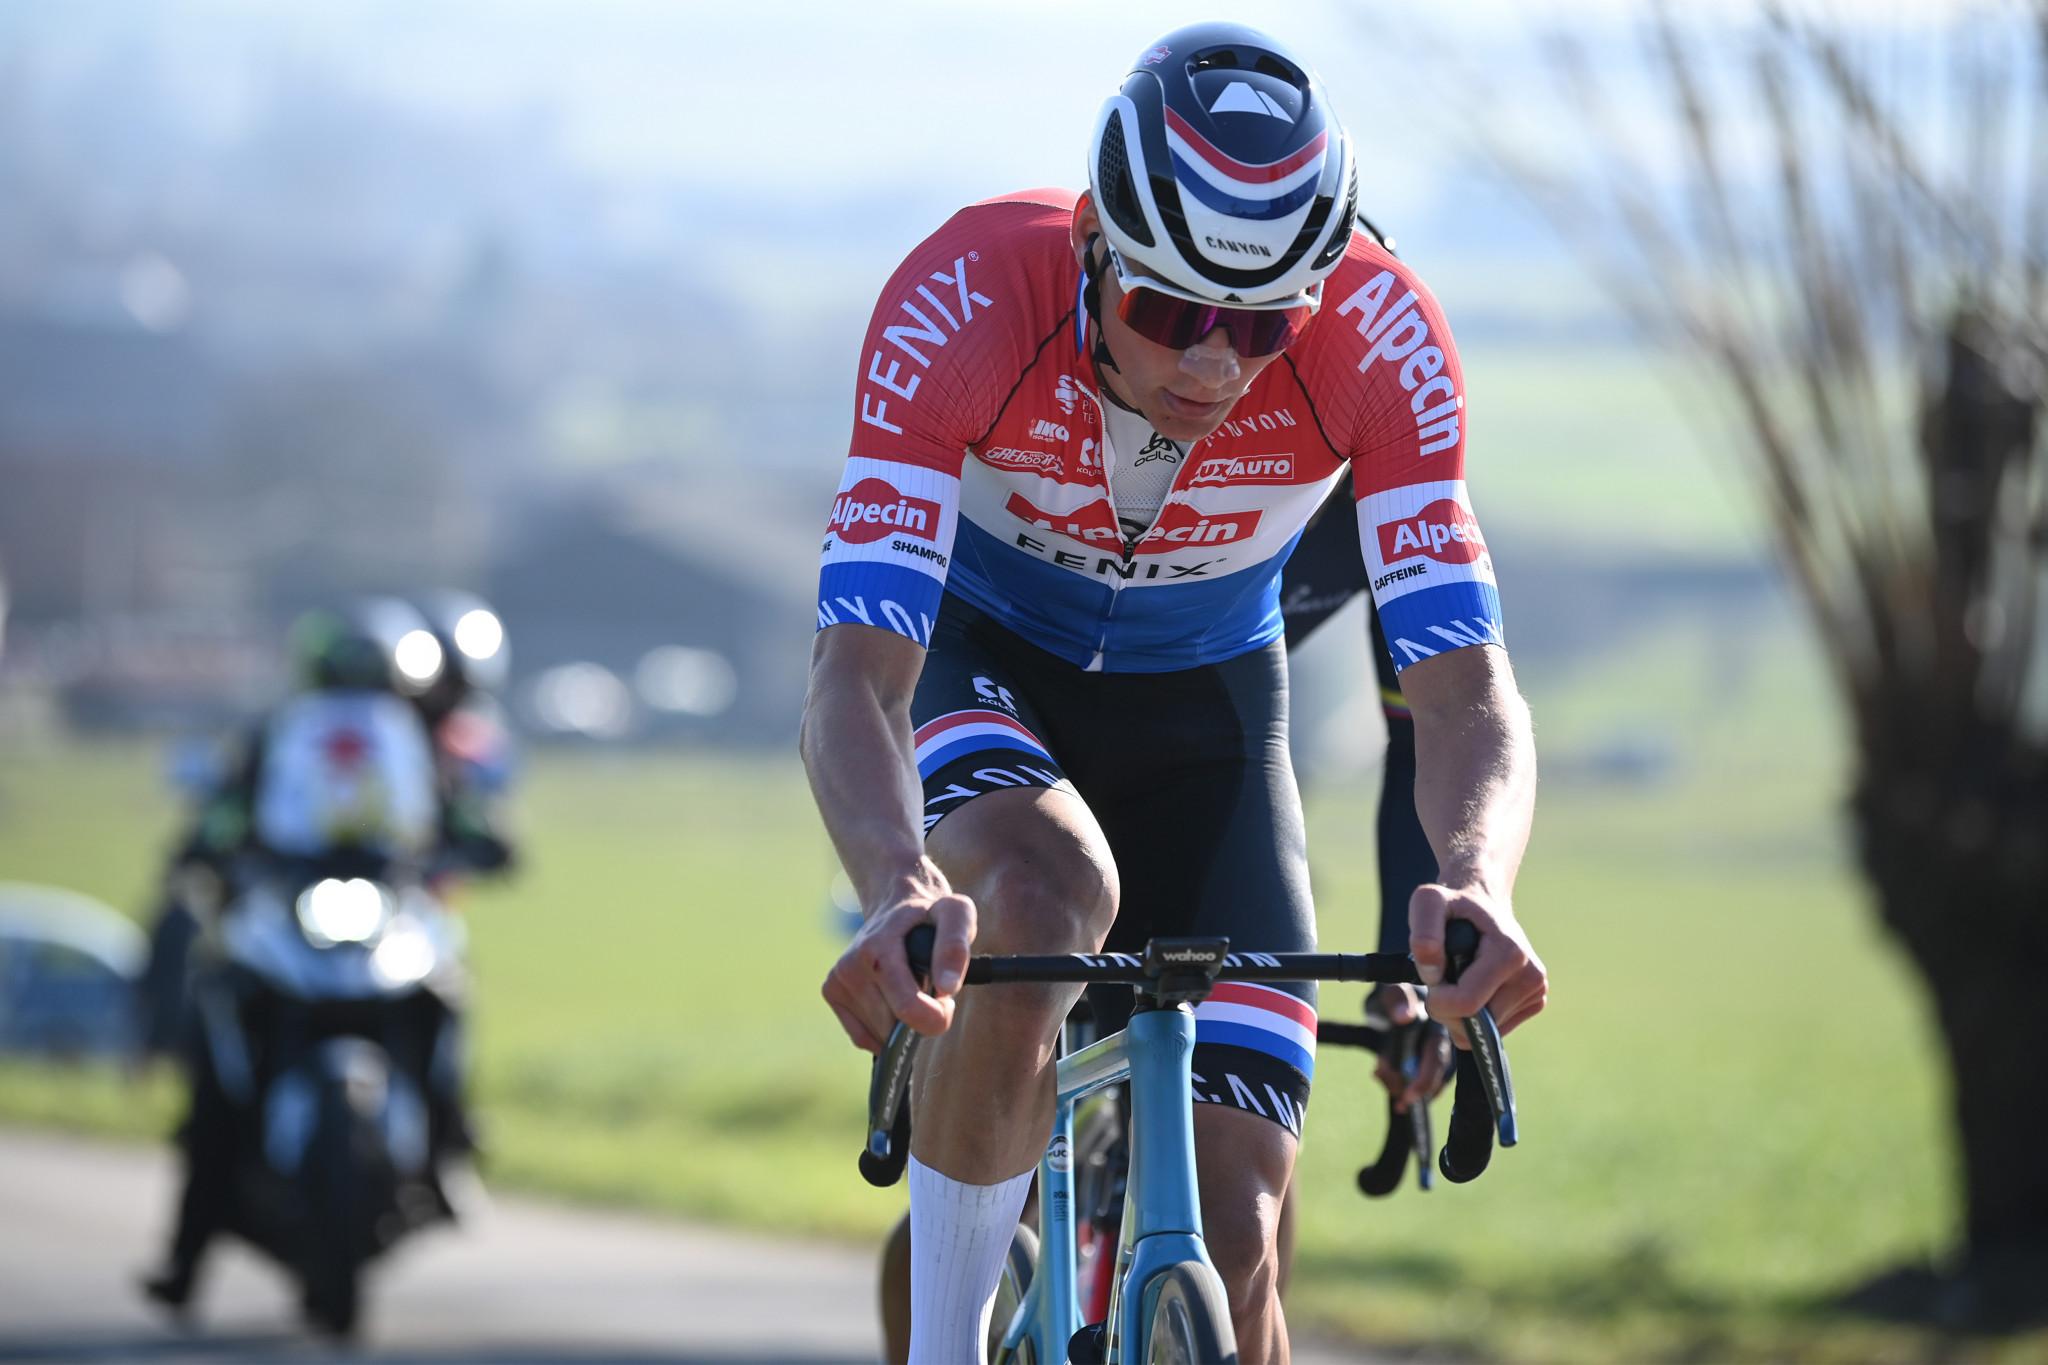 Out-of-contention Van der Poel wins stage five of Tirreno-Adriatico